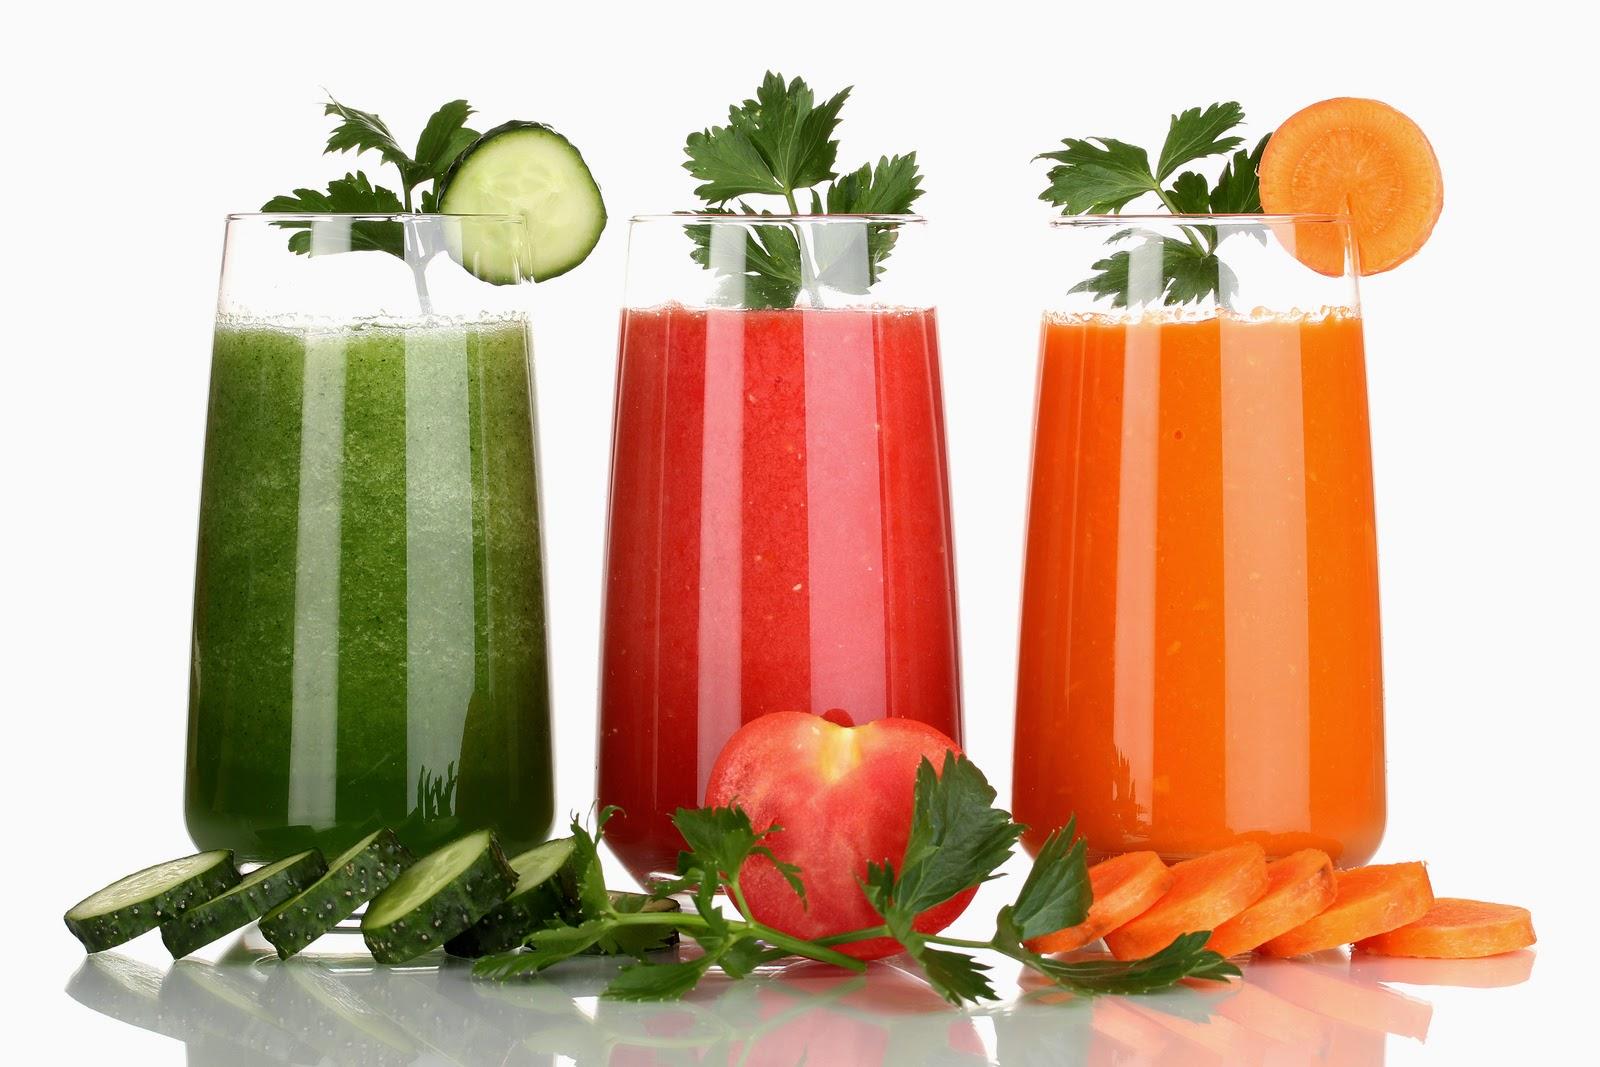 centrifuga-detox-food-blogger-roberta-mirata-metamorphose-concept-wellness-health (3)